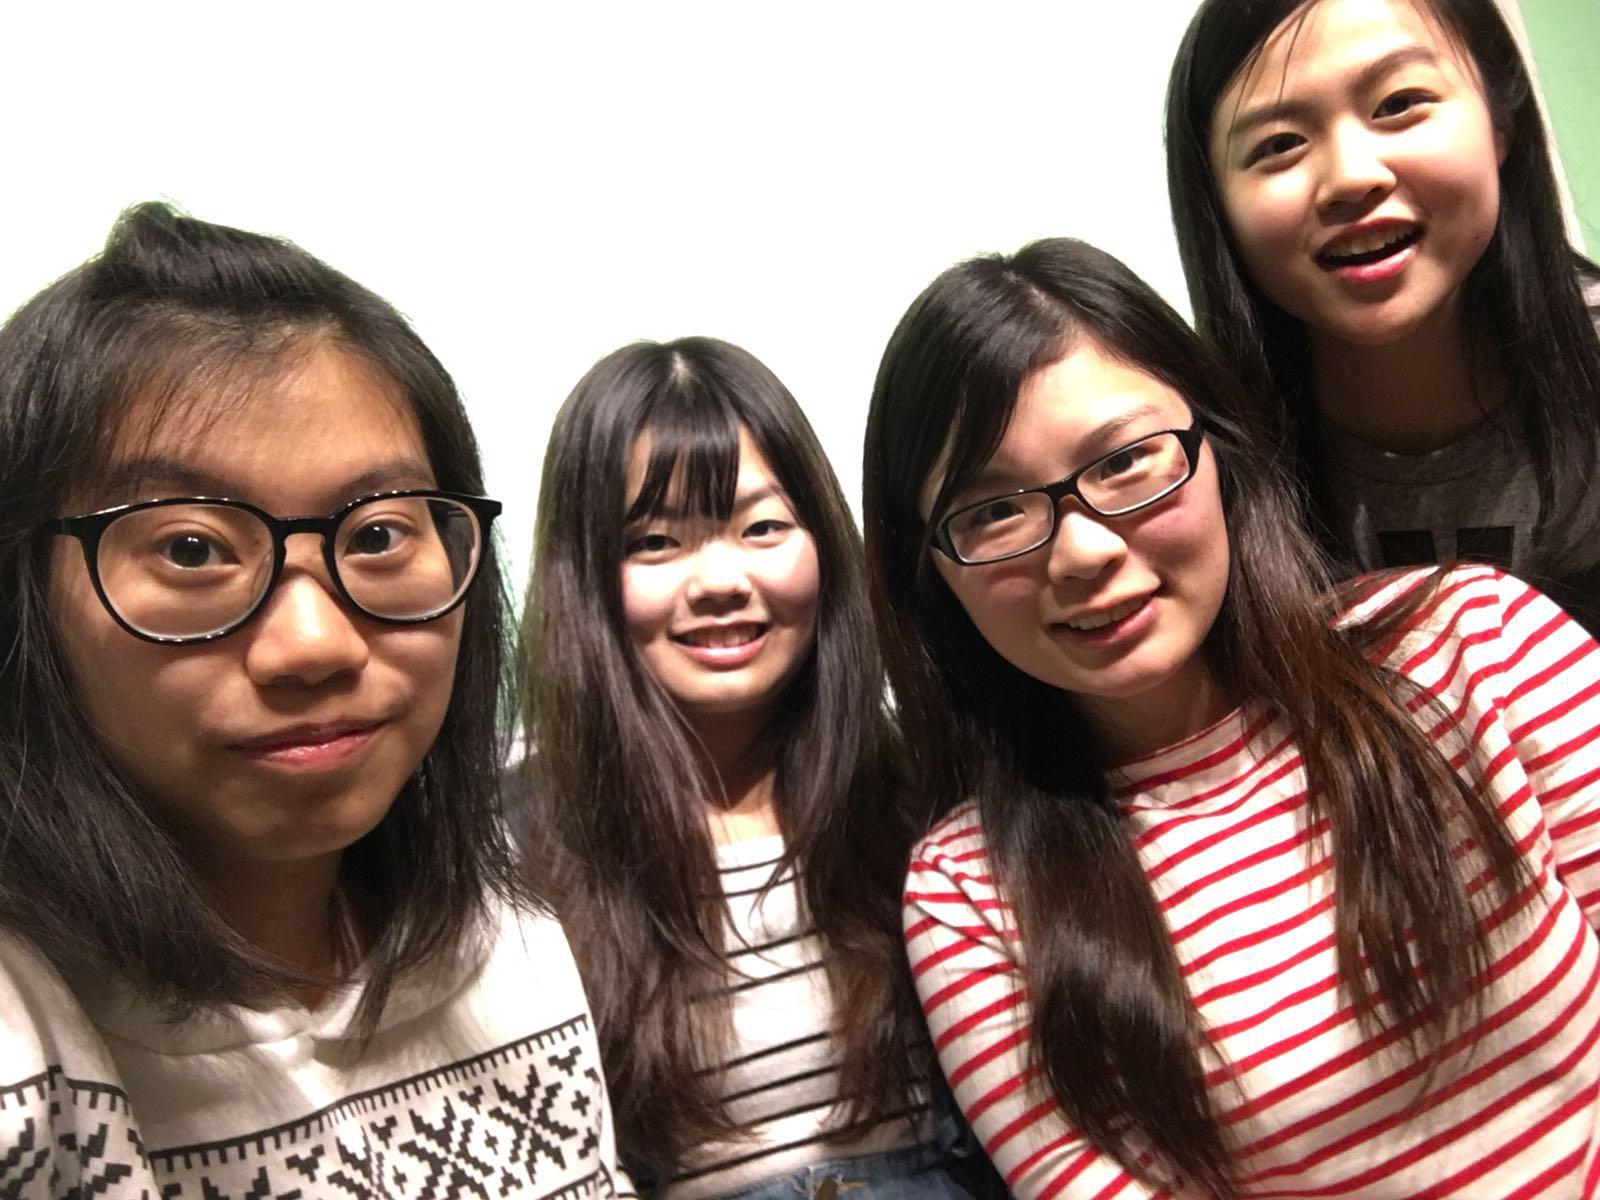 team 55648480020161023132658 photo